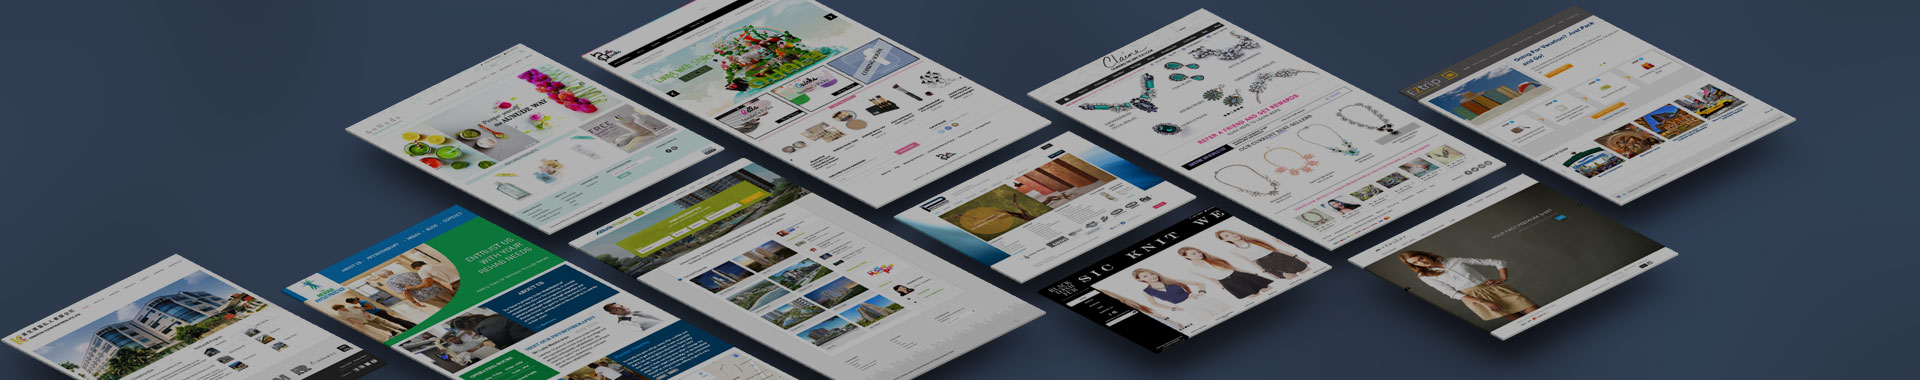 Website Design Singapore - Nikon Lenswear Singapore